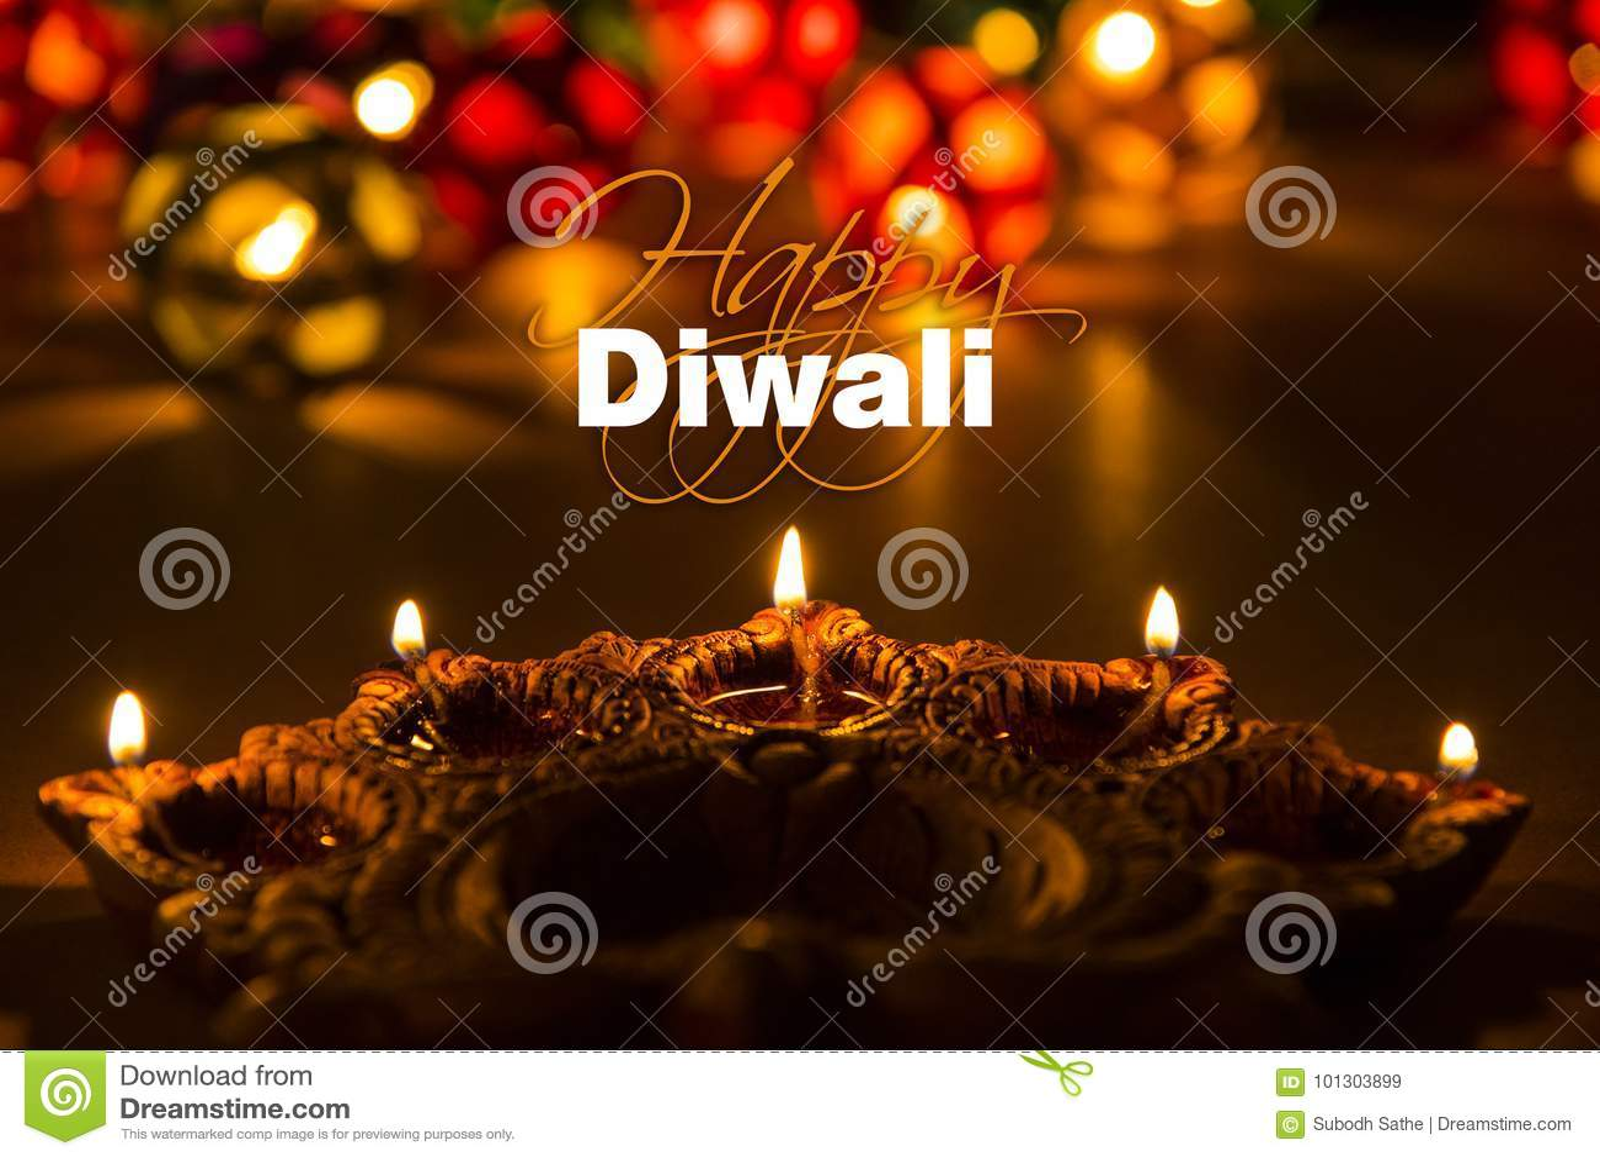 Happy Diwali Diwali Greeting Card With Illuminated Diya Stock